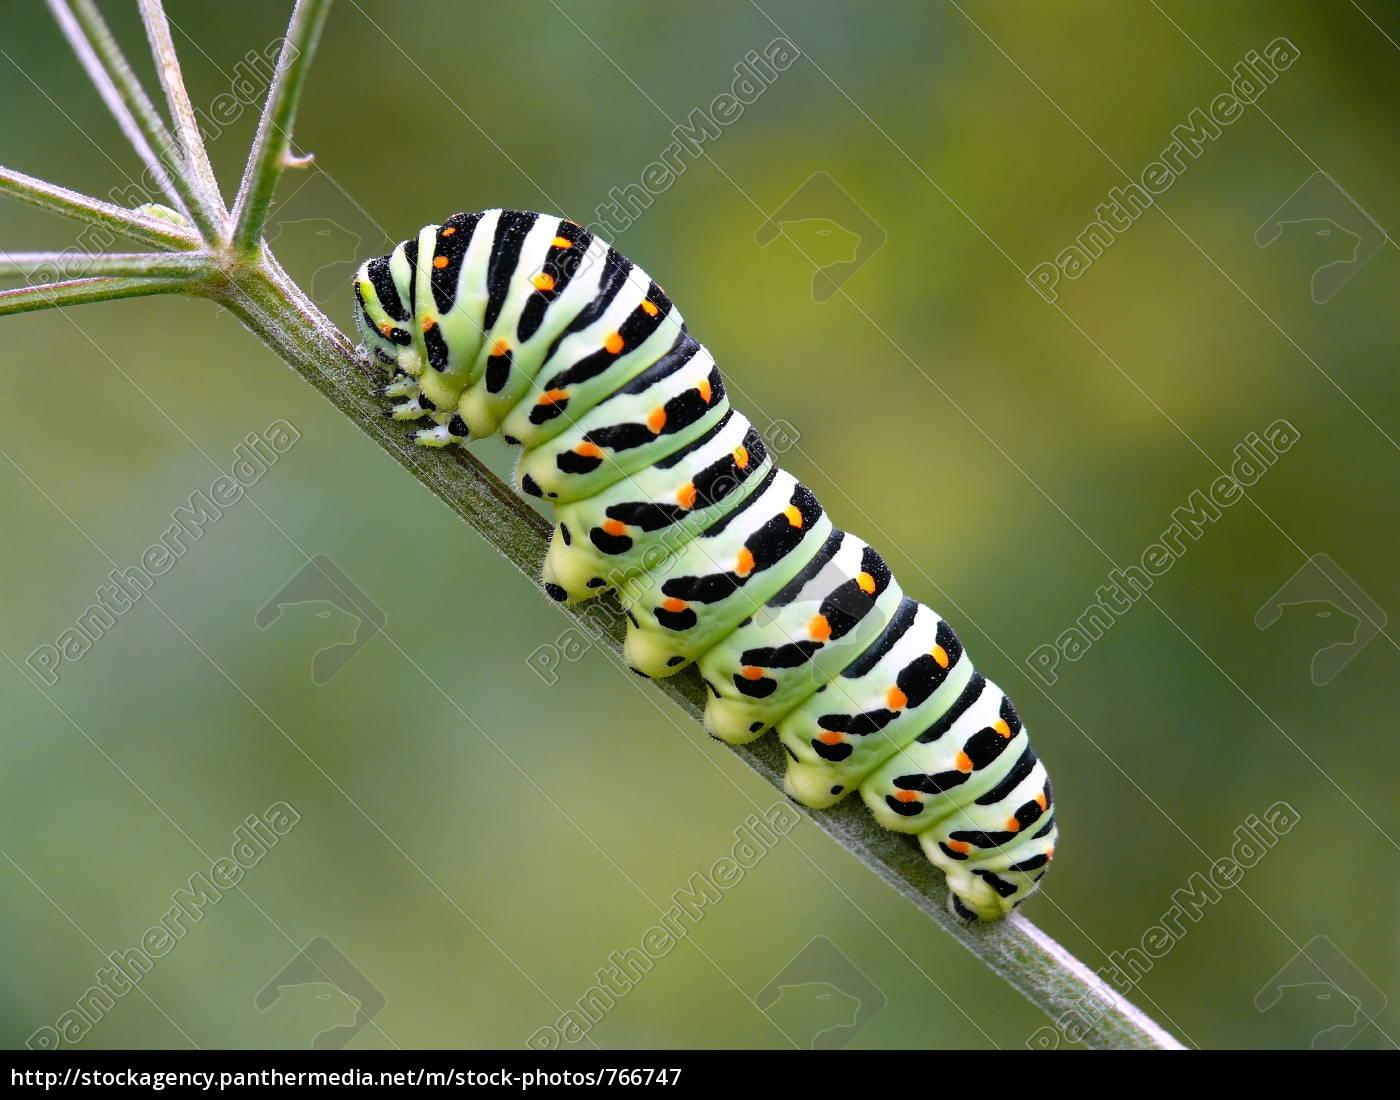 caterpillar, of, the, swallowtail - 766747